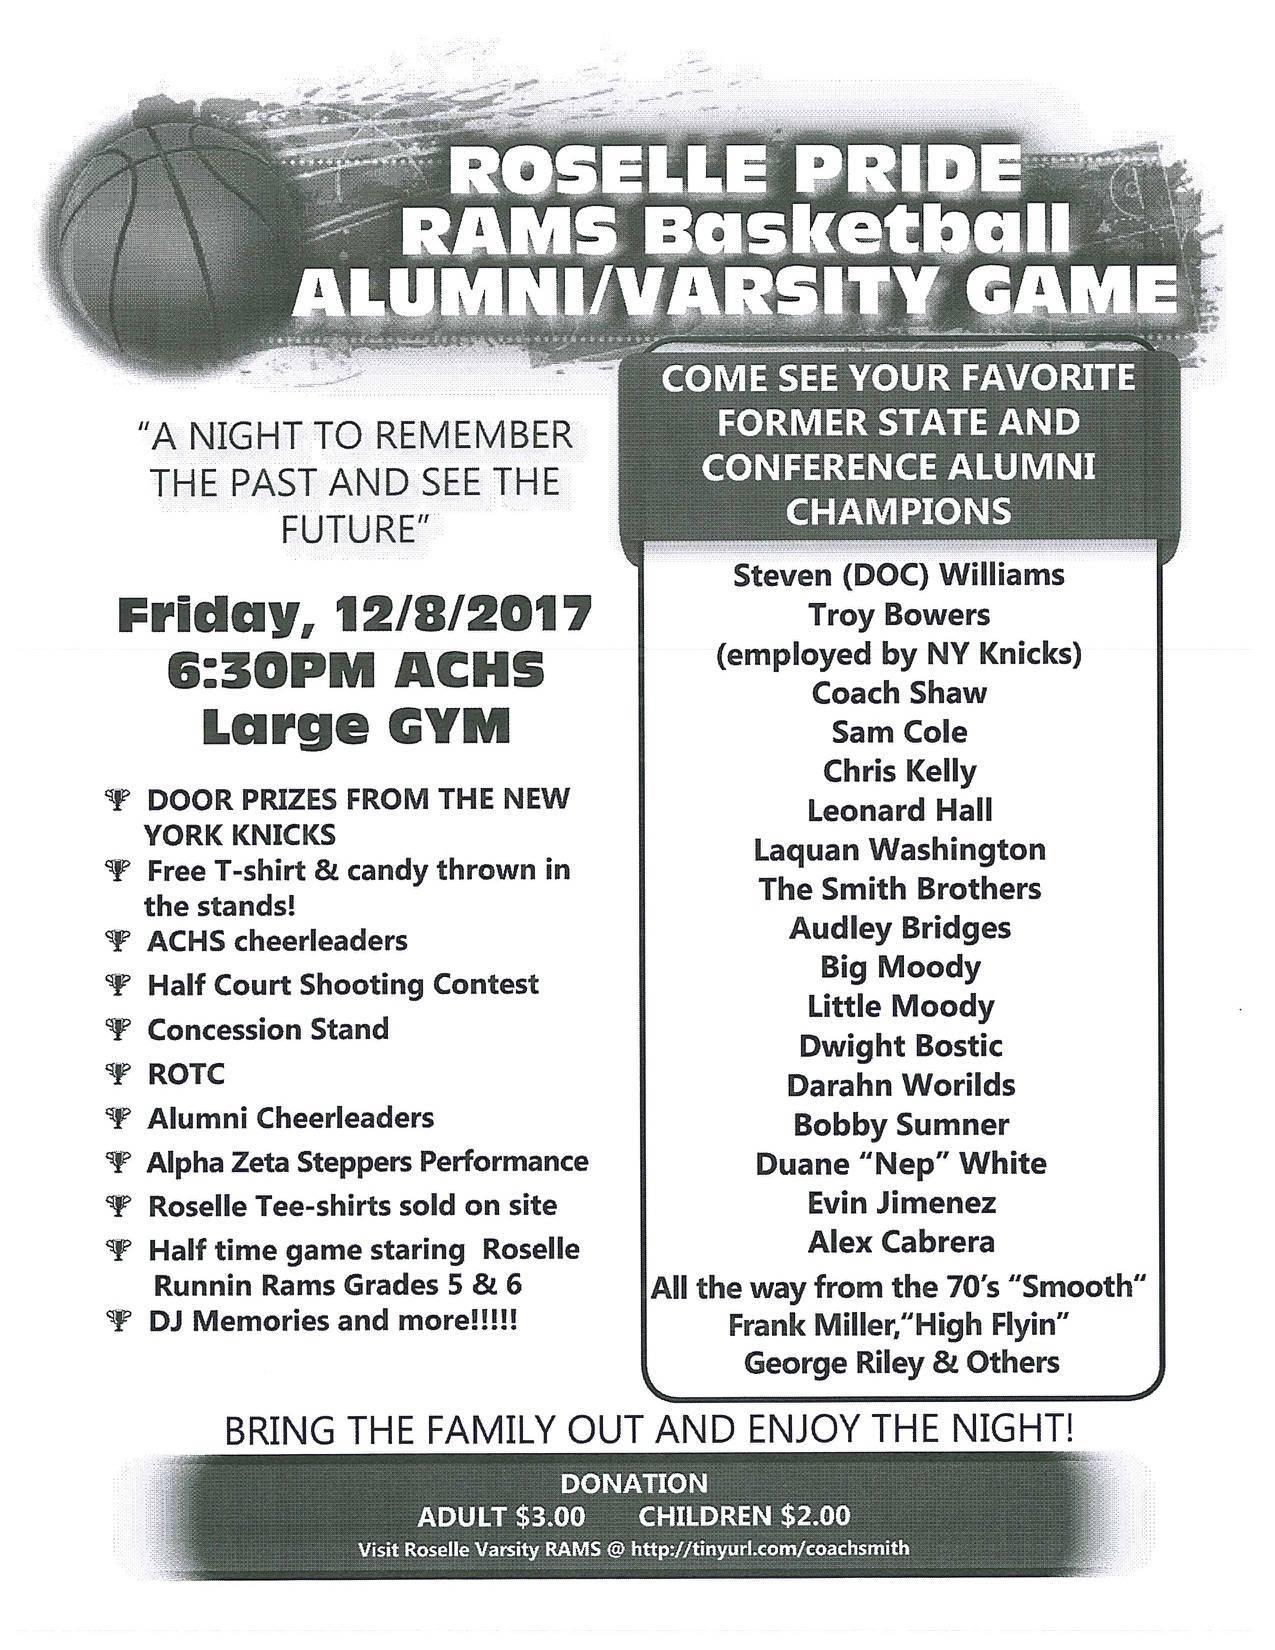 422f805886f7d2f9b5cd_Abraham_Clark_High_School_2017_Alumni_Basketball_Ball_Flyer.jpg